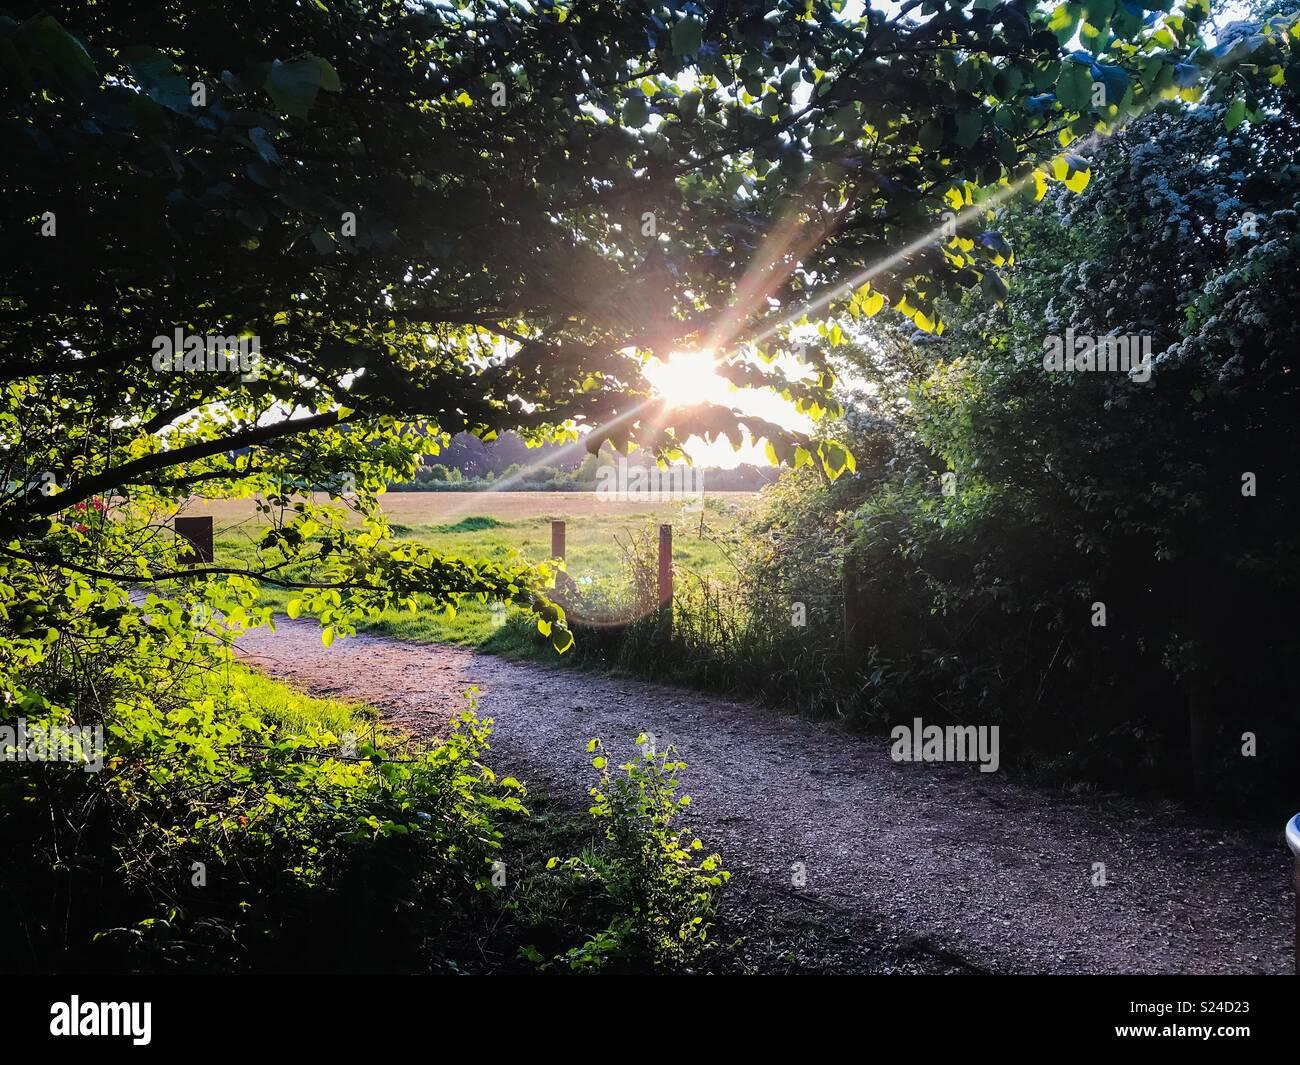 Country Park Spaziergang bei Sonnenuntergang Stockbild